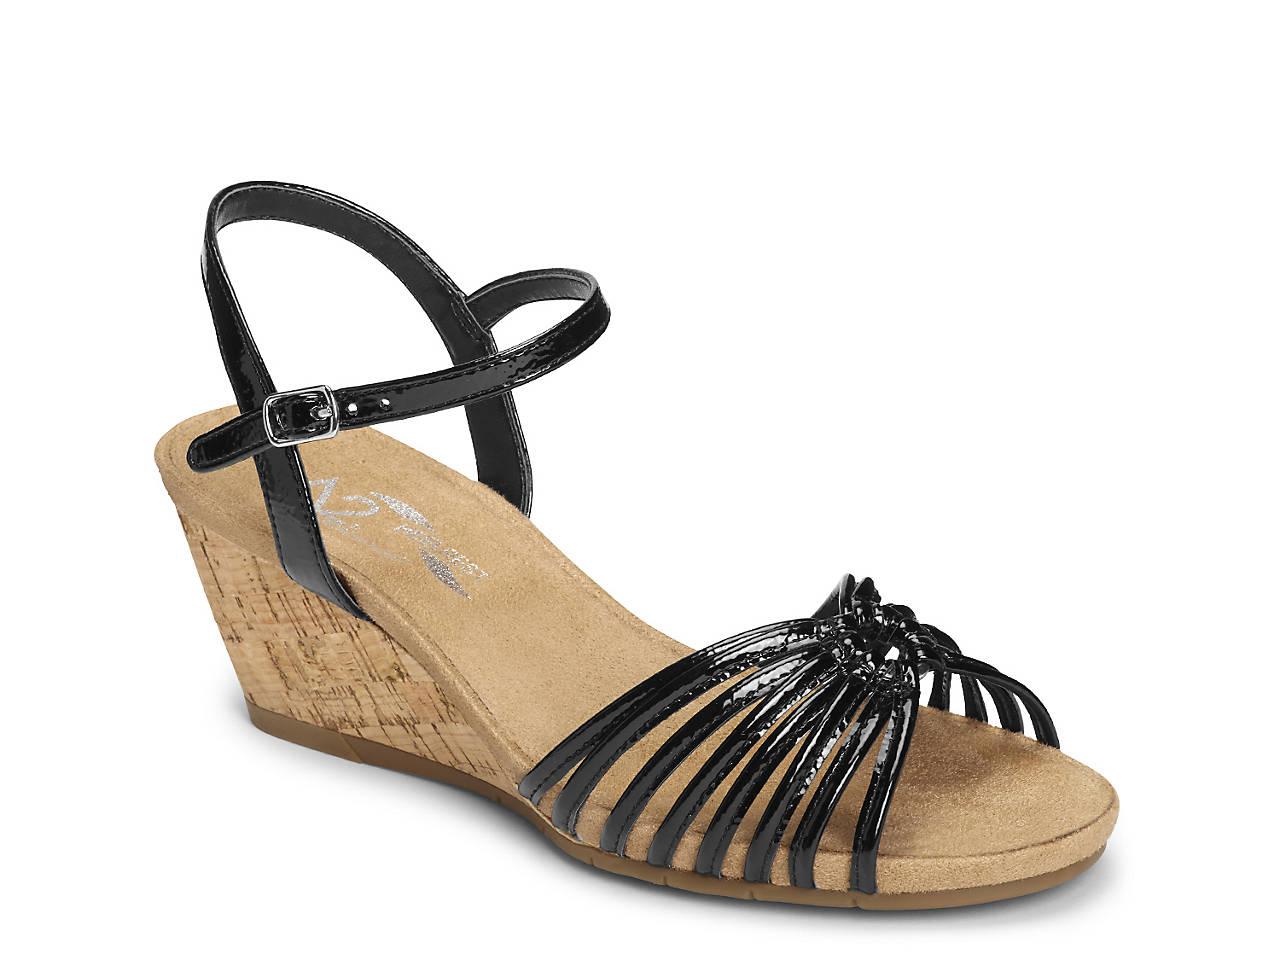 cb997c659d39 A2 by Aerosoles Fruit Cake Wedge Sandal Women s Shoes